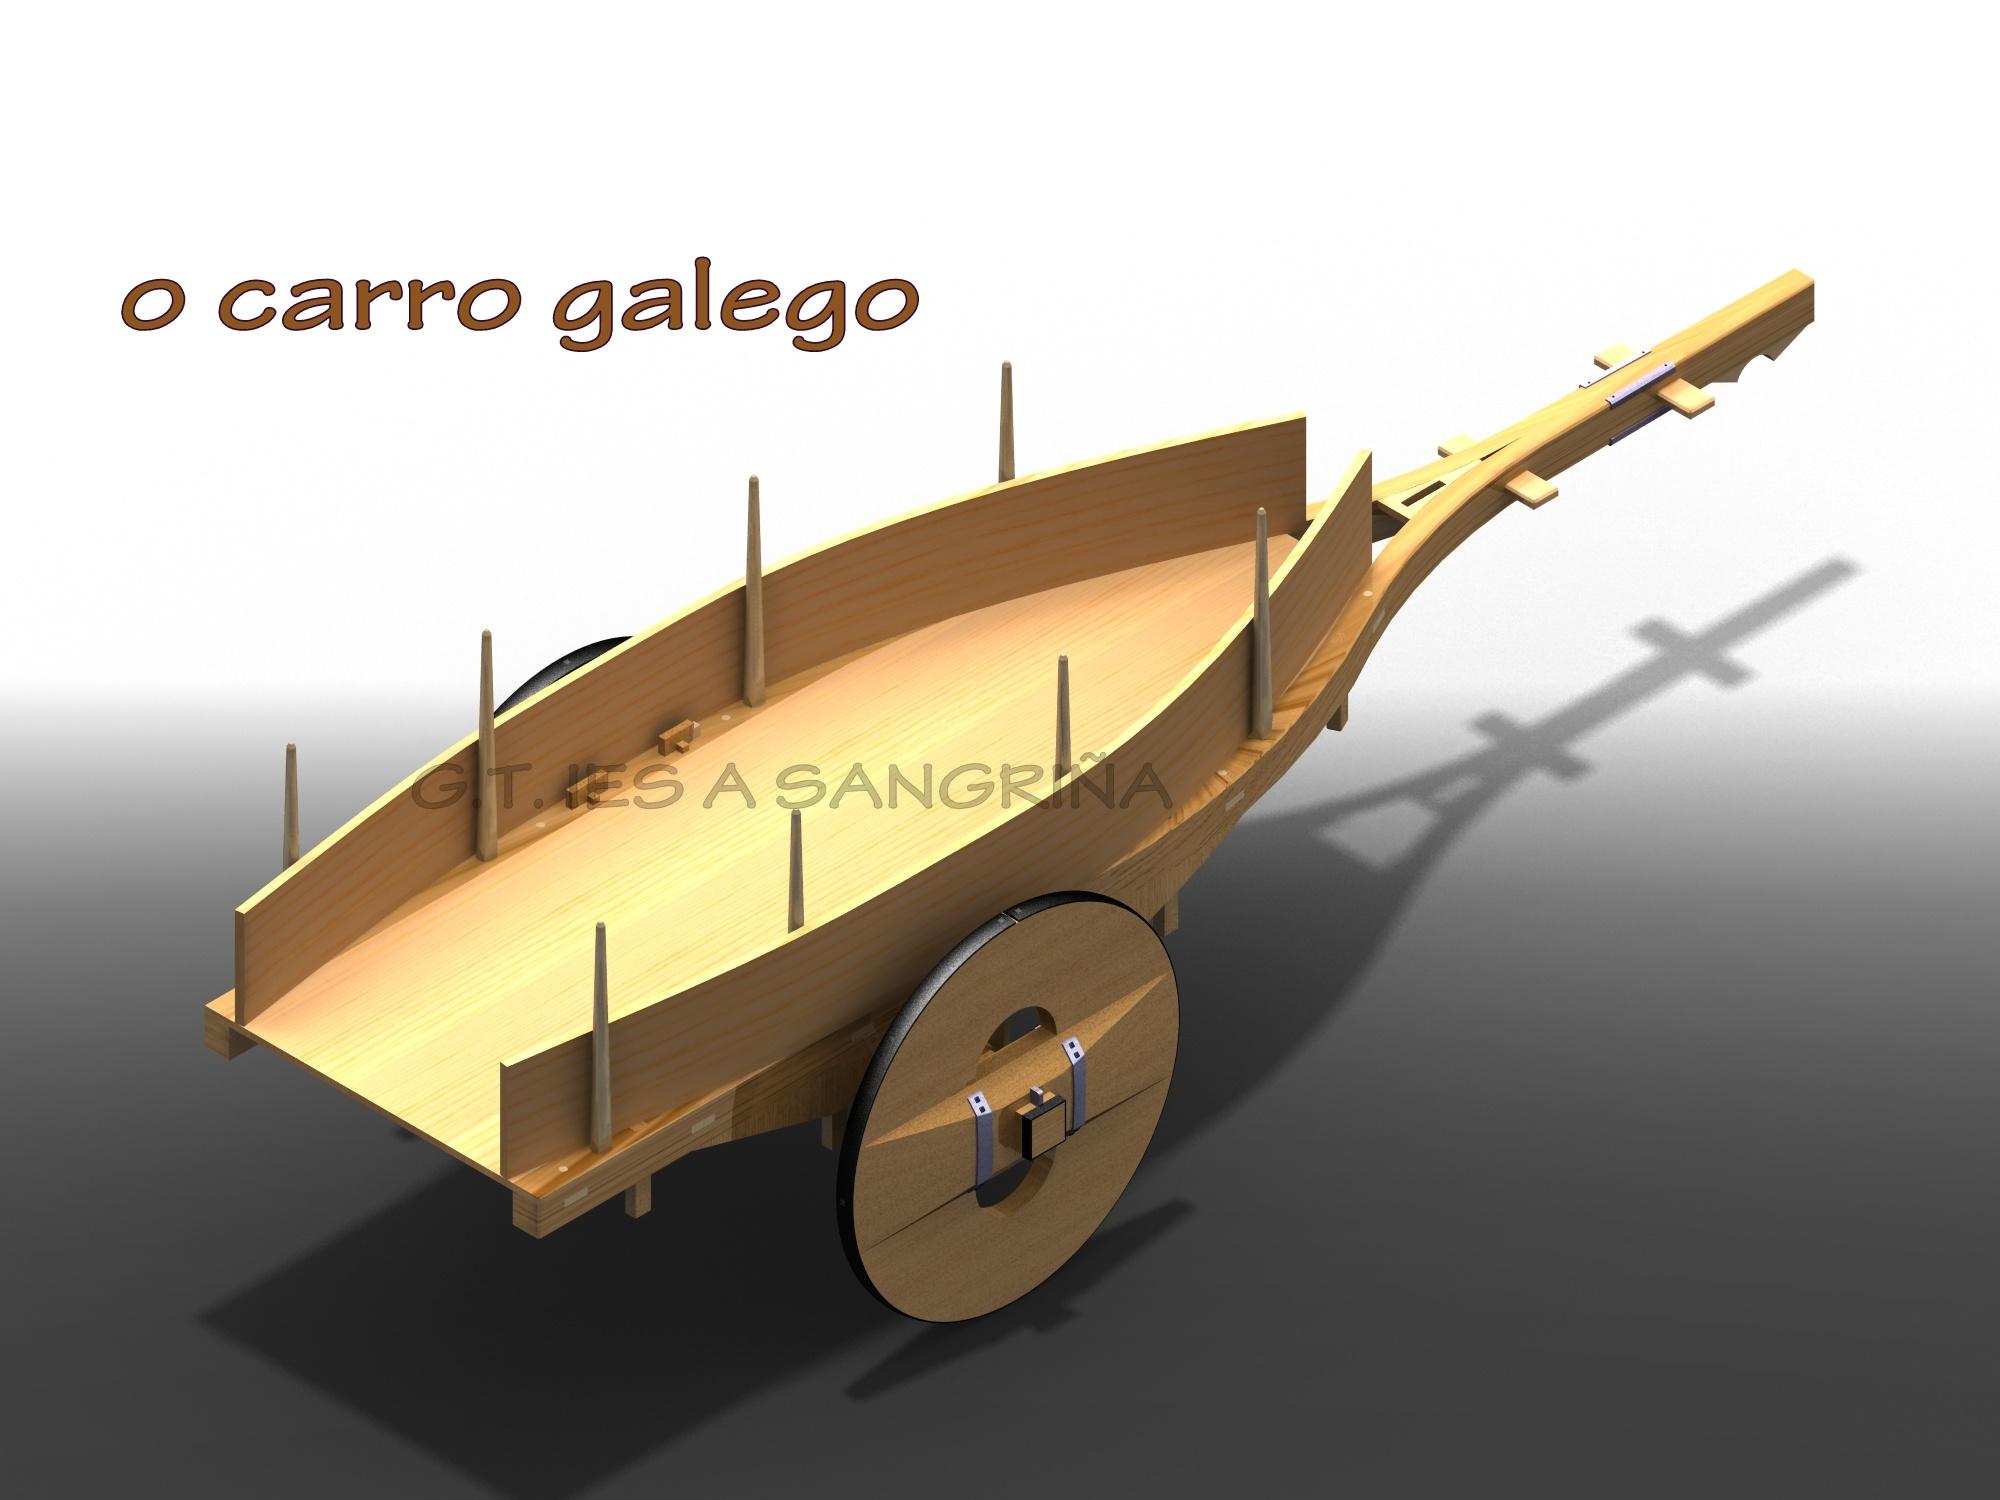 O carro galego I